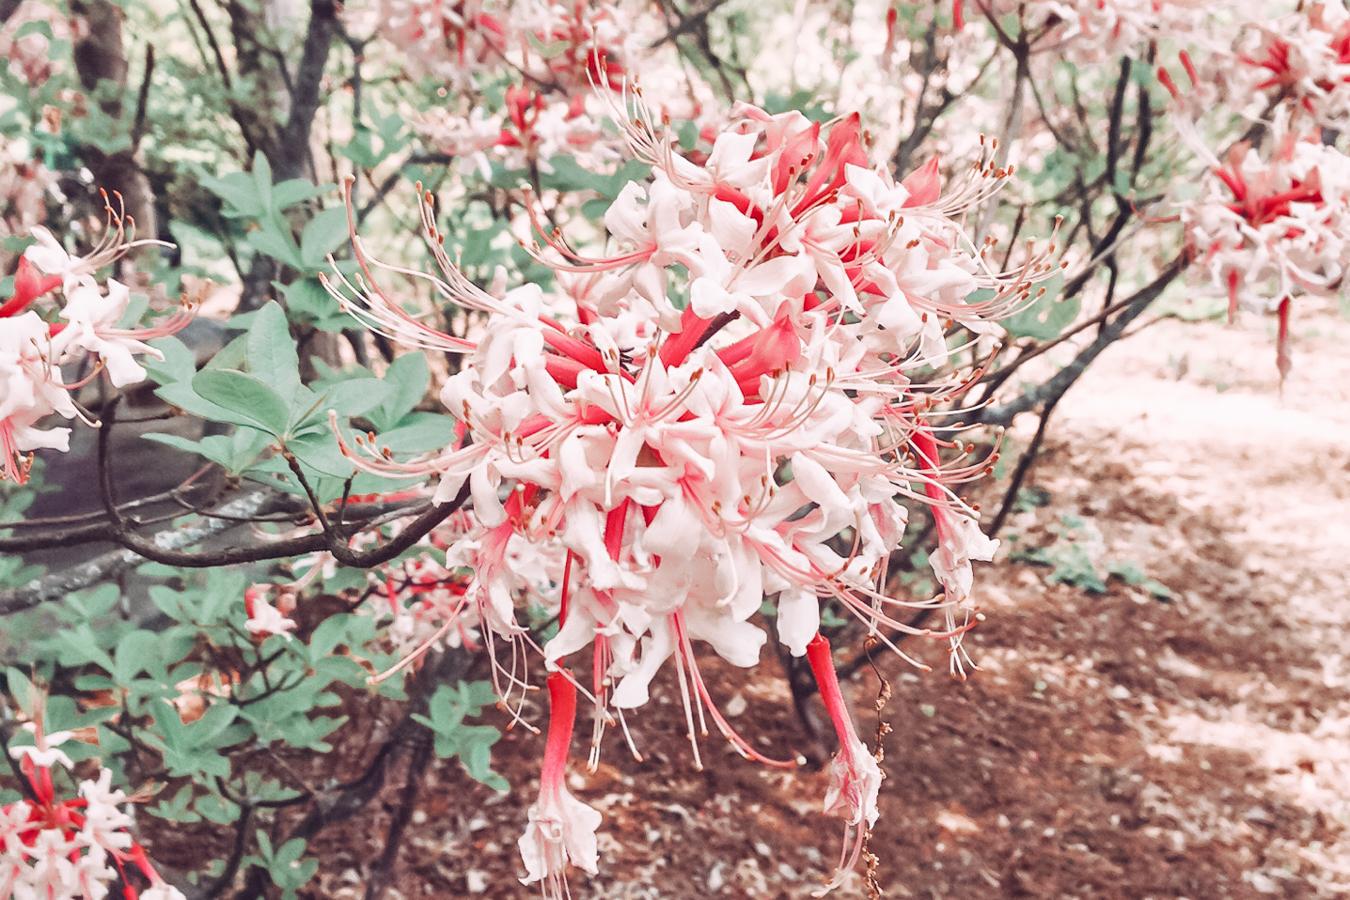 Flowers at the Cheekwood Botanical Gardens